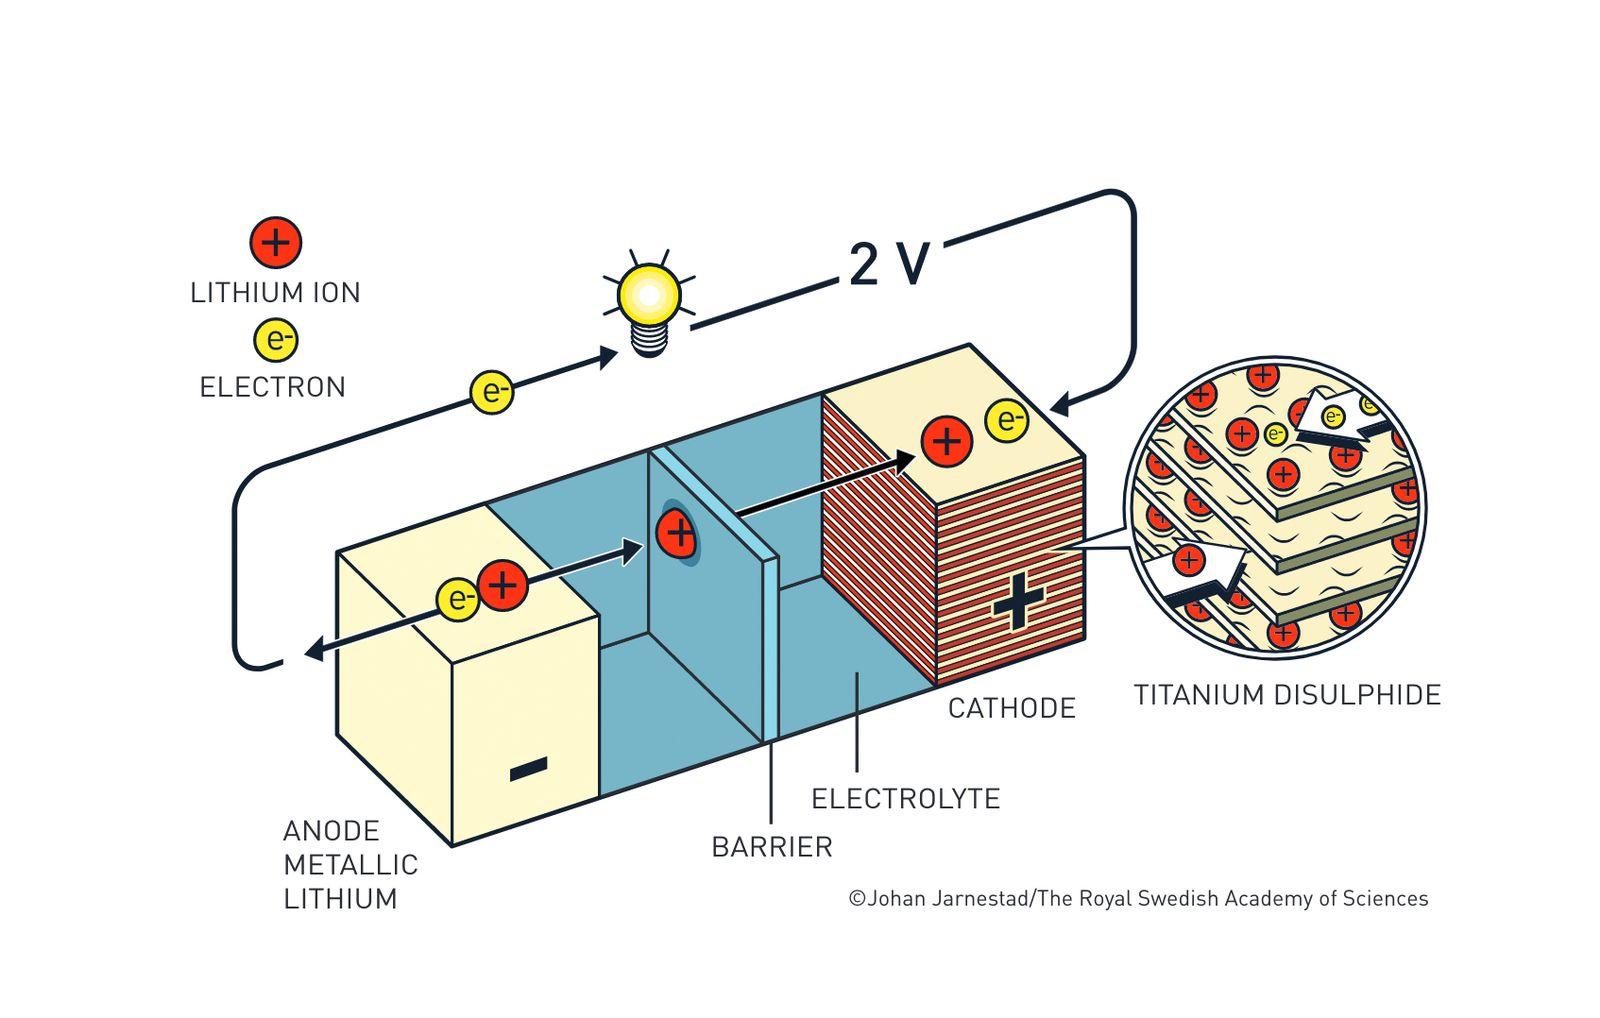 EINMALIGE VERWENDUNG Nobelpreis/ Chemie